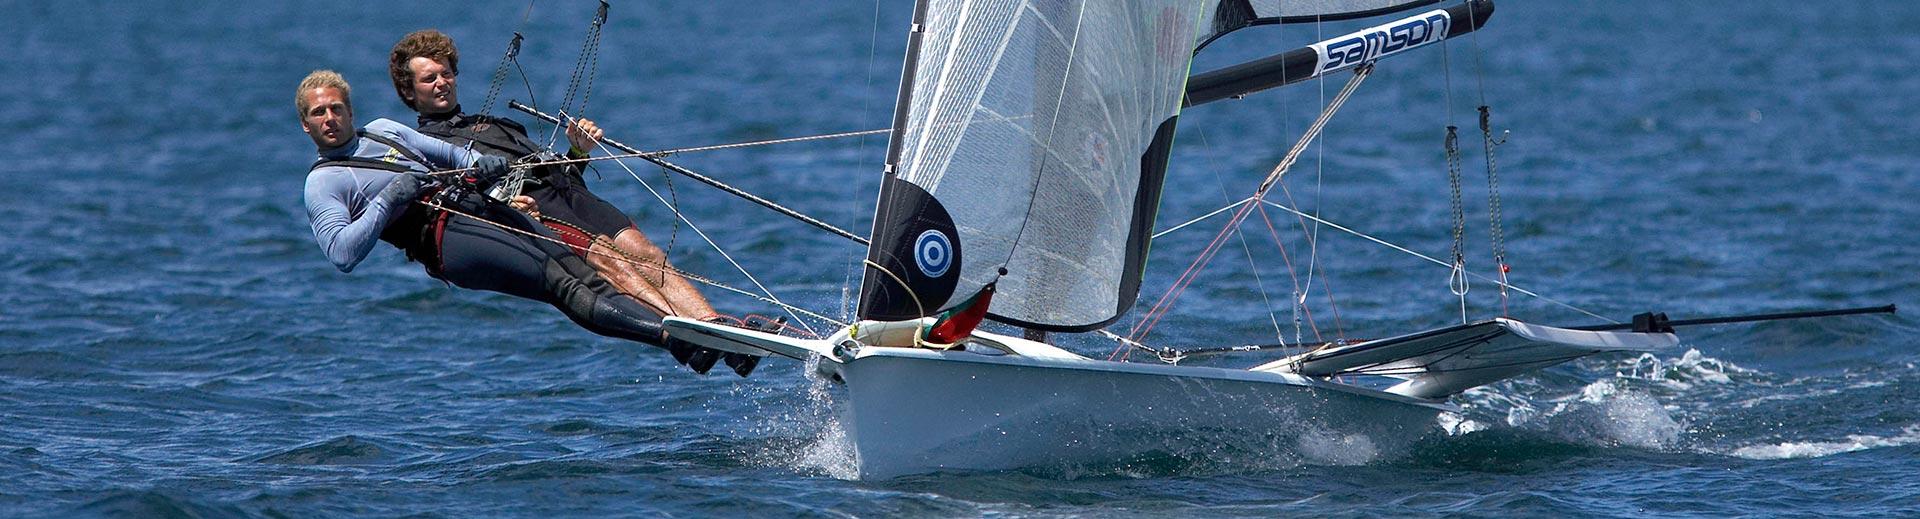 sailing event